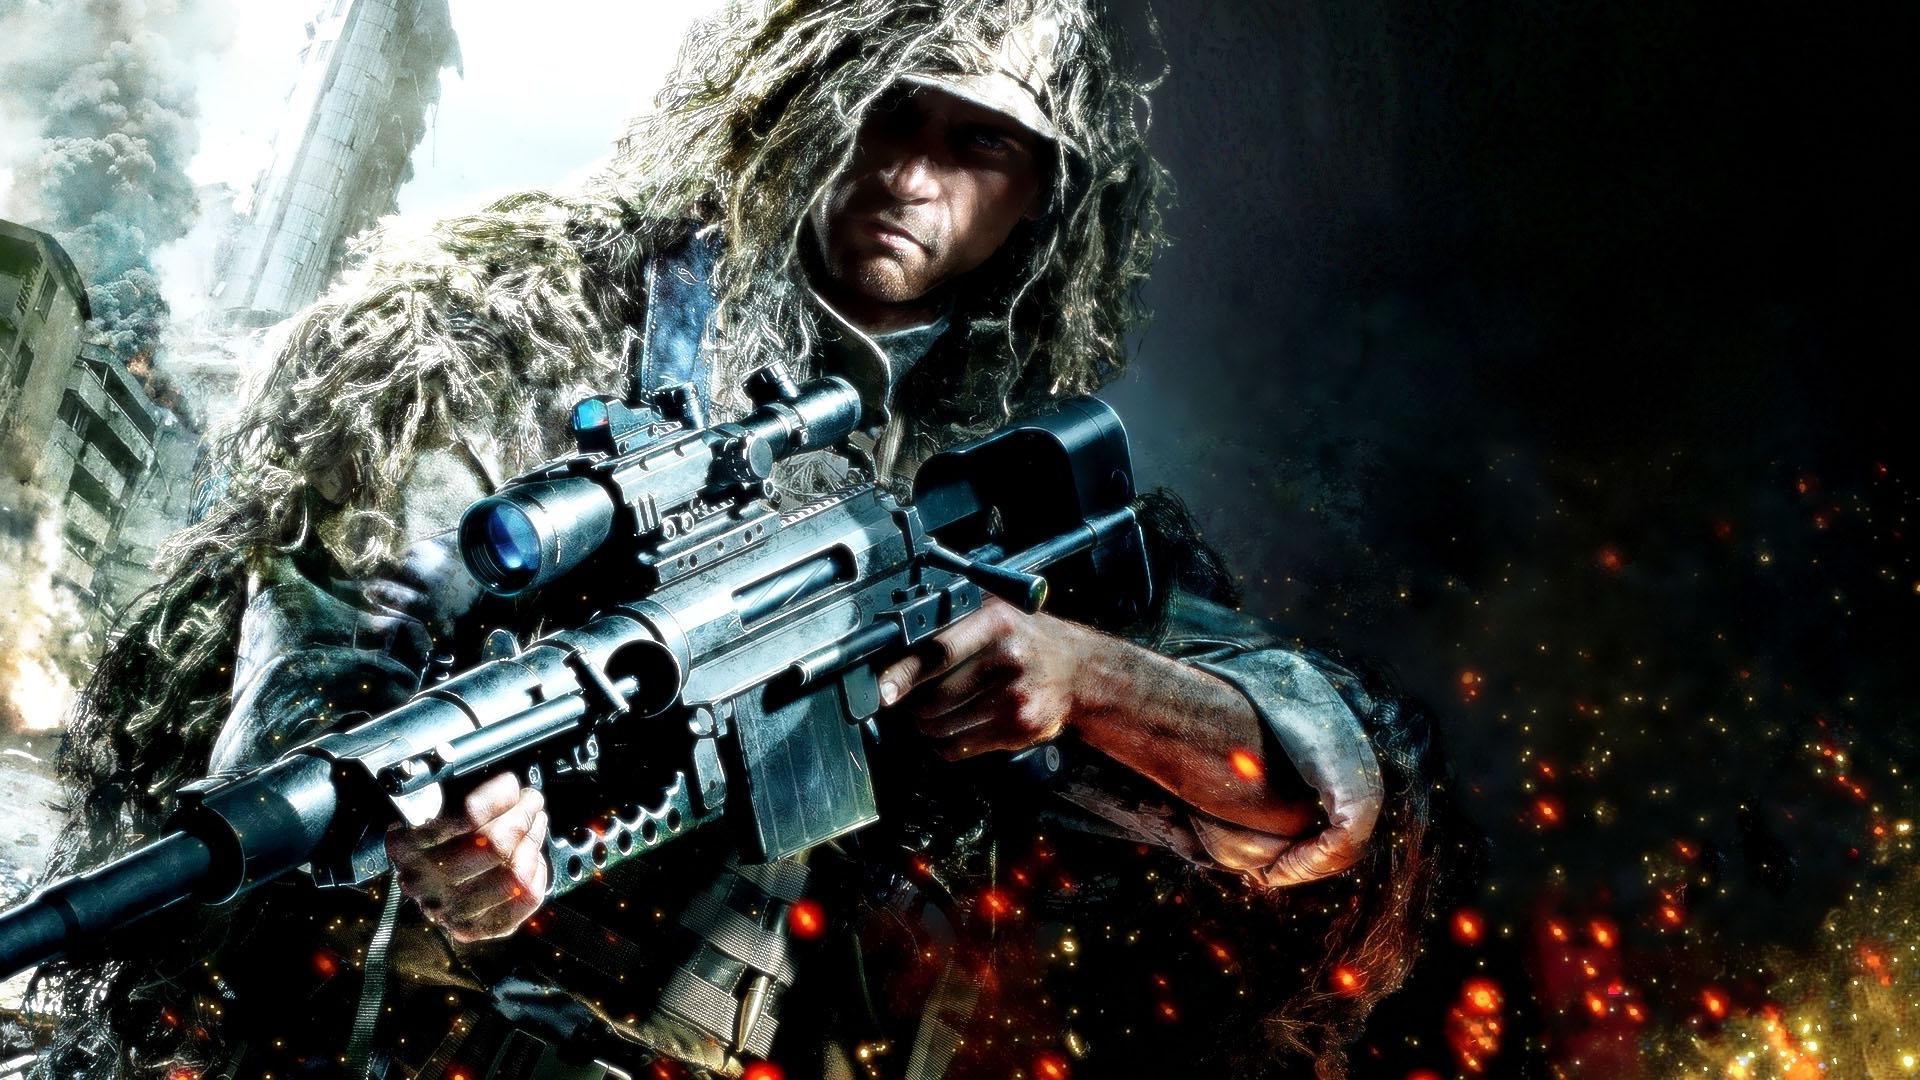 Sniper Scope Wallpaper Hd PC Sniper Scope Wallpaper Hd Most